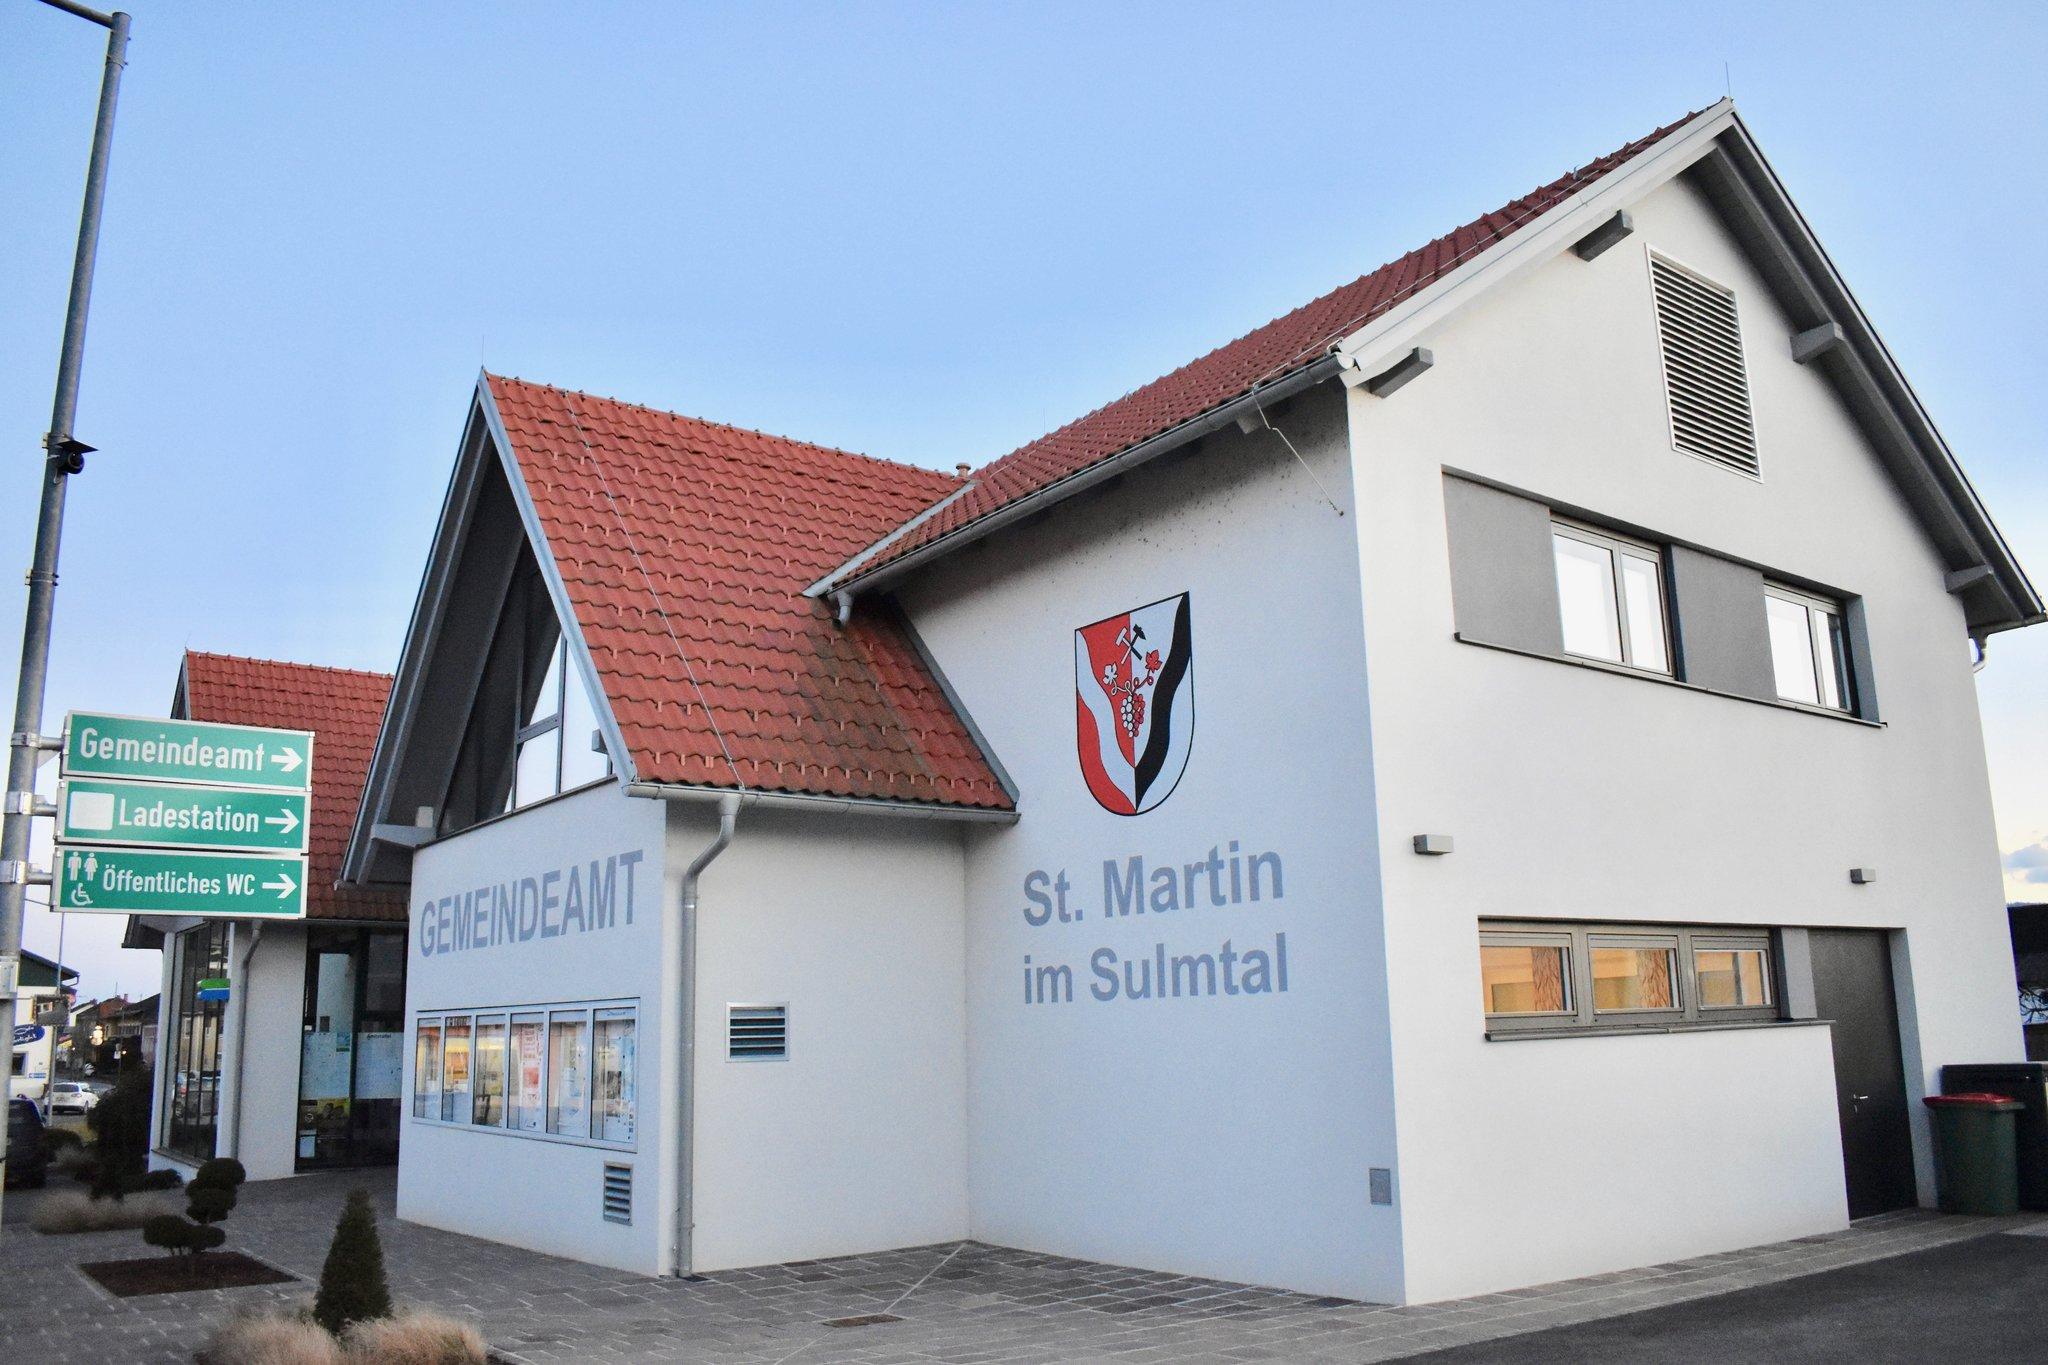 Sankt martin im sulmtal single mnner: Vomp singles kostenlos